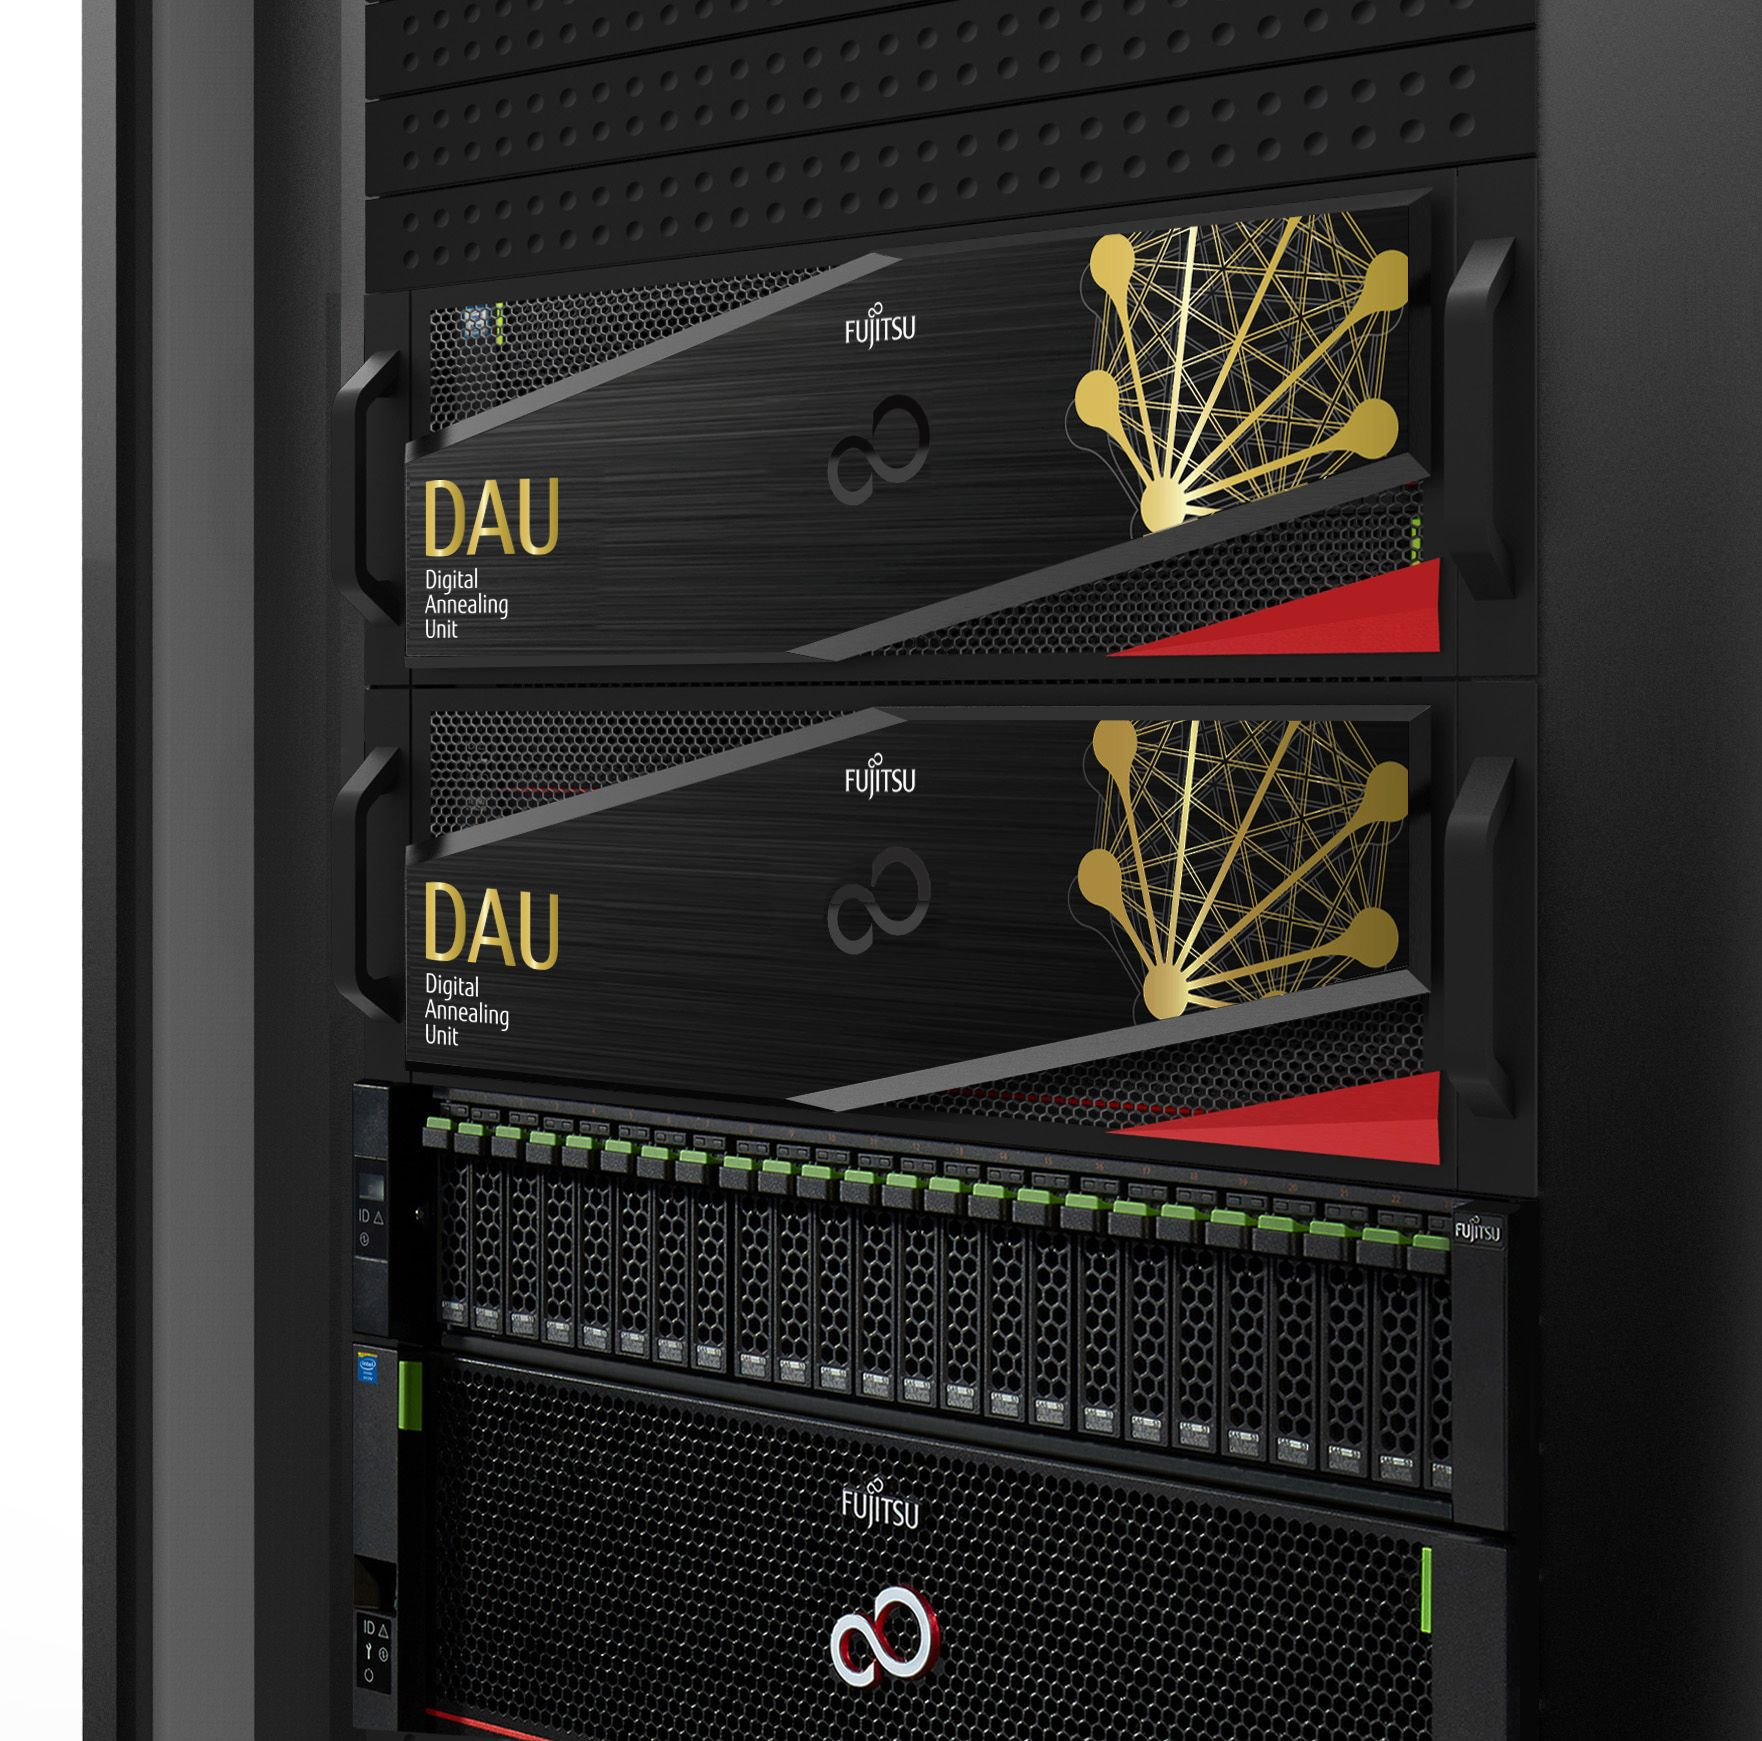 Fujitsu's CMOS Digital Annealer in server racks.